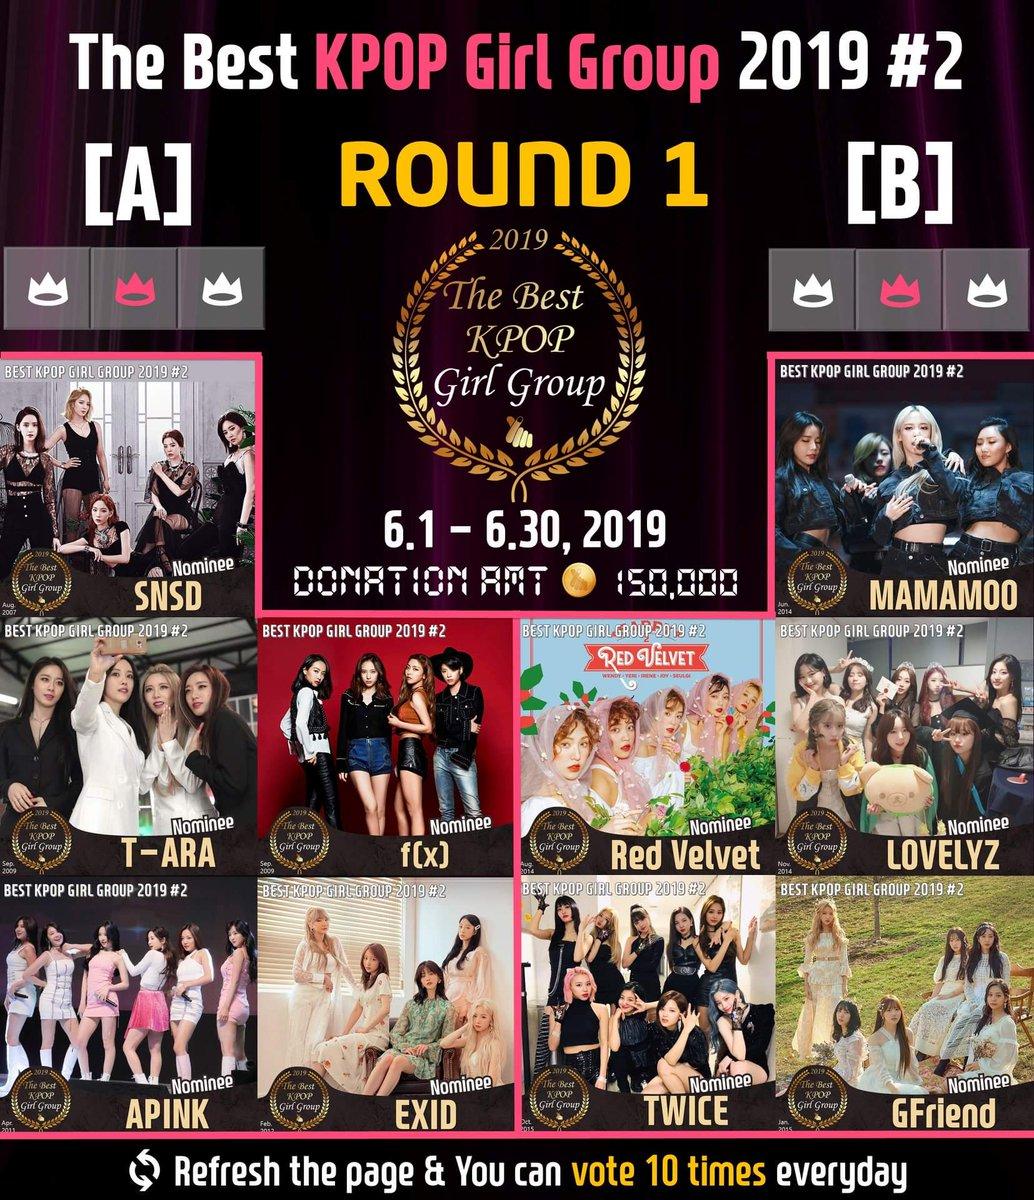 🏆The Best KPOP Girl Group 2019 #2 🎯Round1 : ~ Jun 30, Tweet added